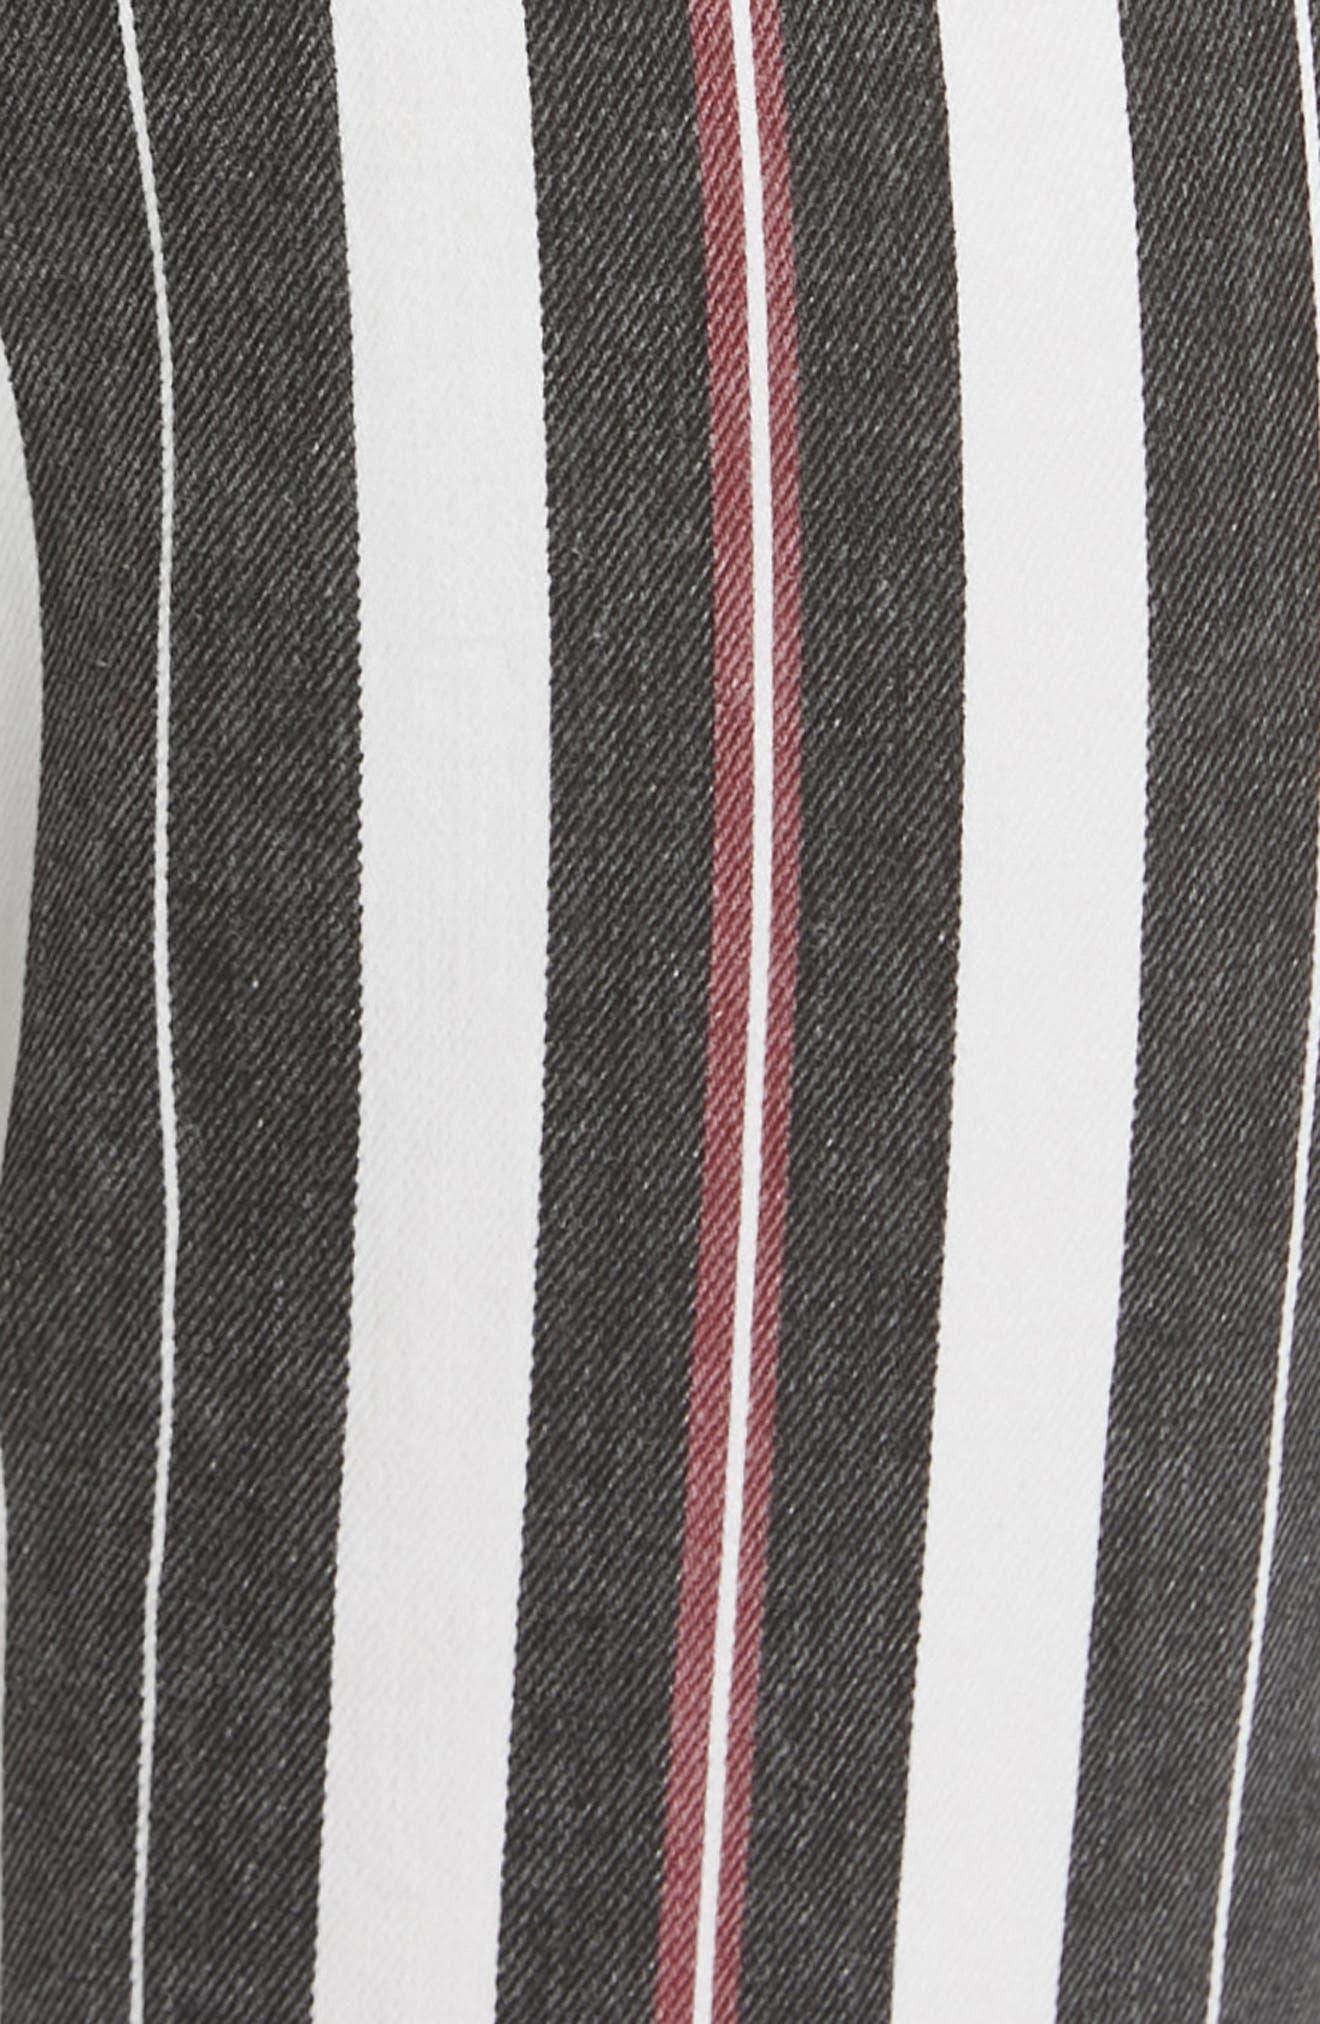 Le Sylvie Band Stripe Straight Leg Jeans,                             Alternate thumbnail 5, color,                             BAND STRIPE